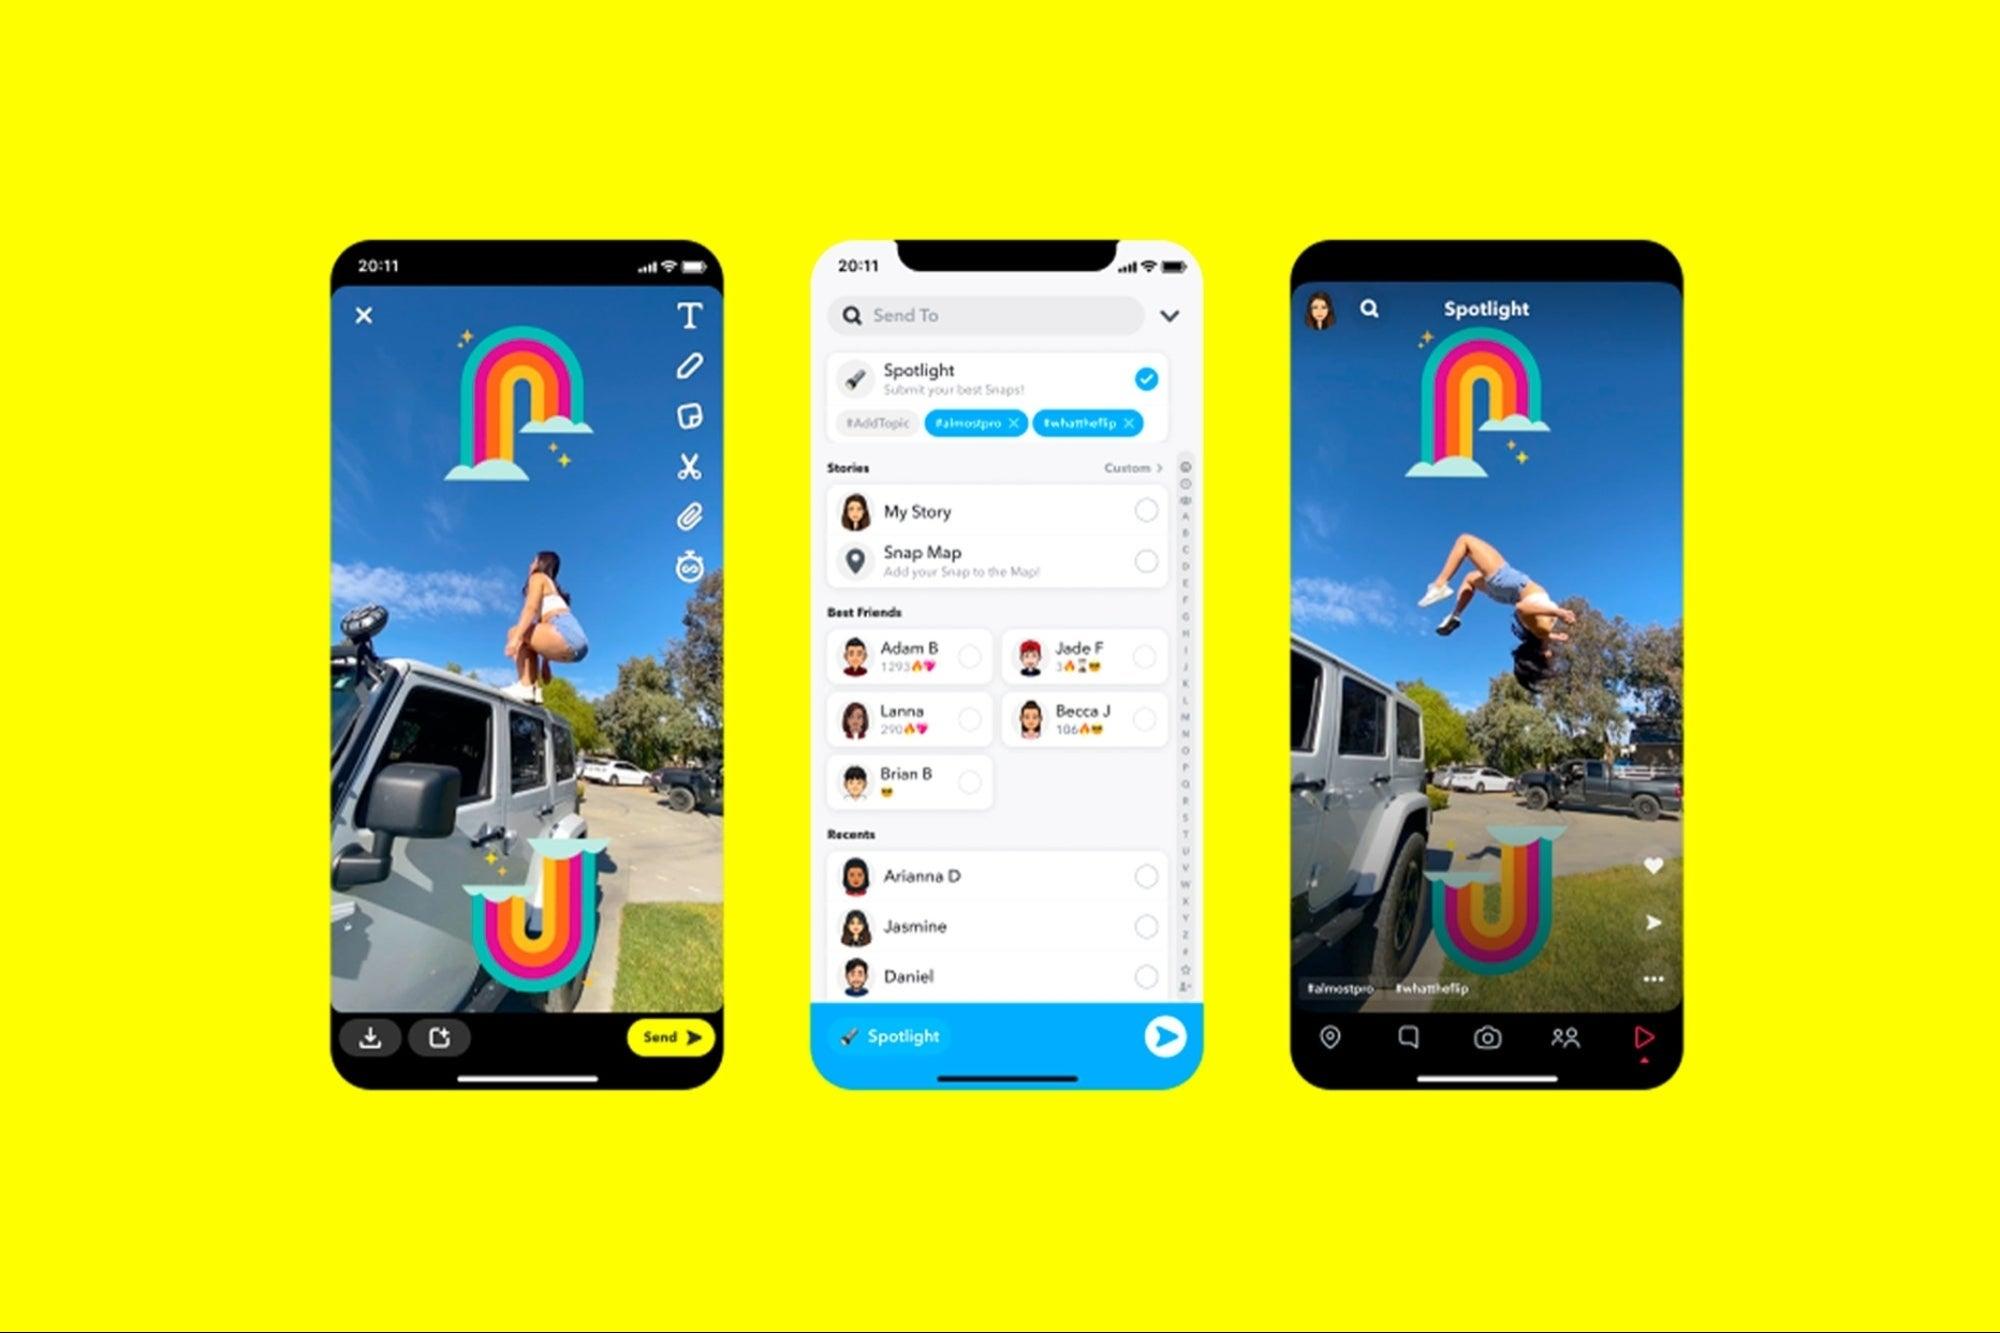 Snapchat launches Spotlight, rival TikTok